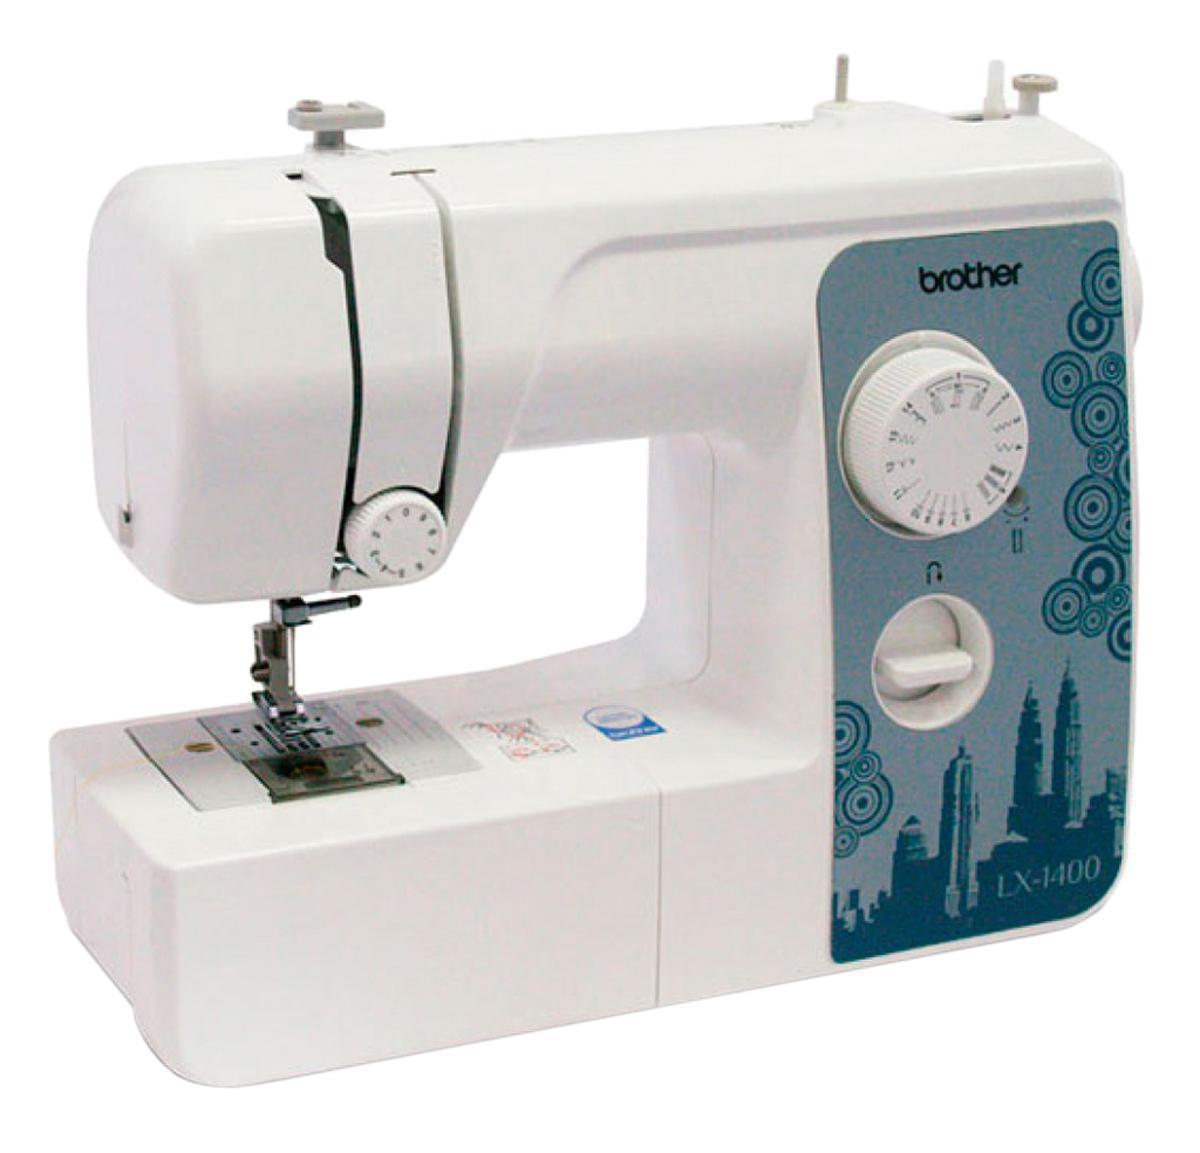 Brother LX-1400 швейная машина773368